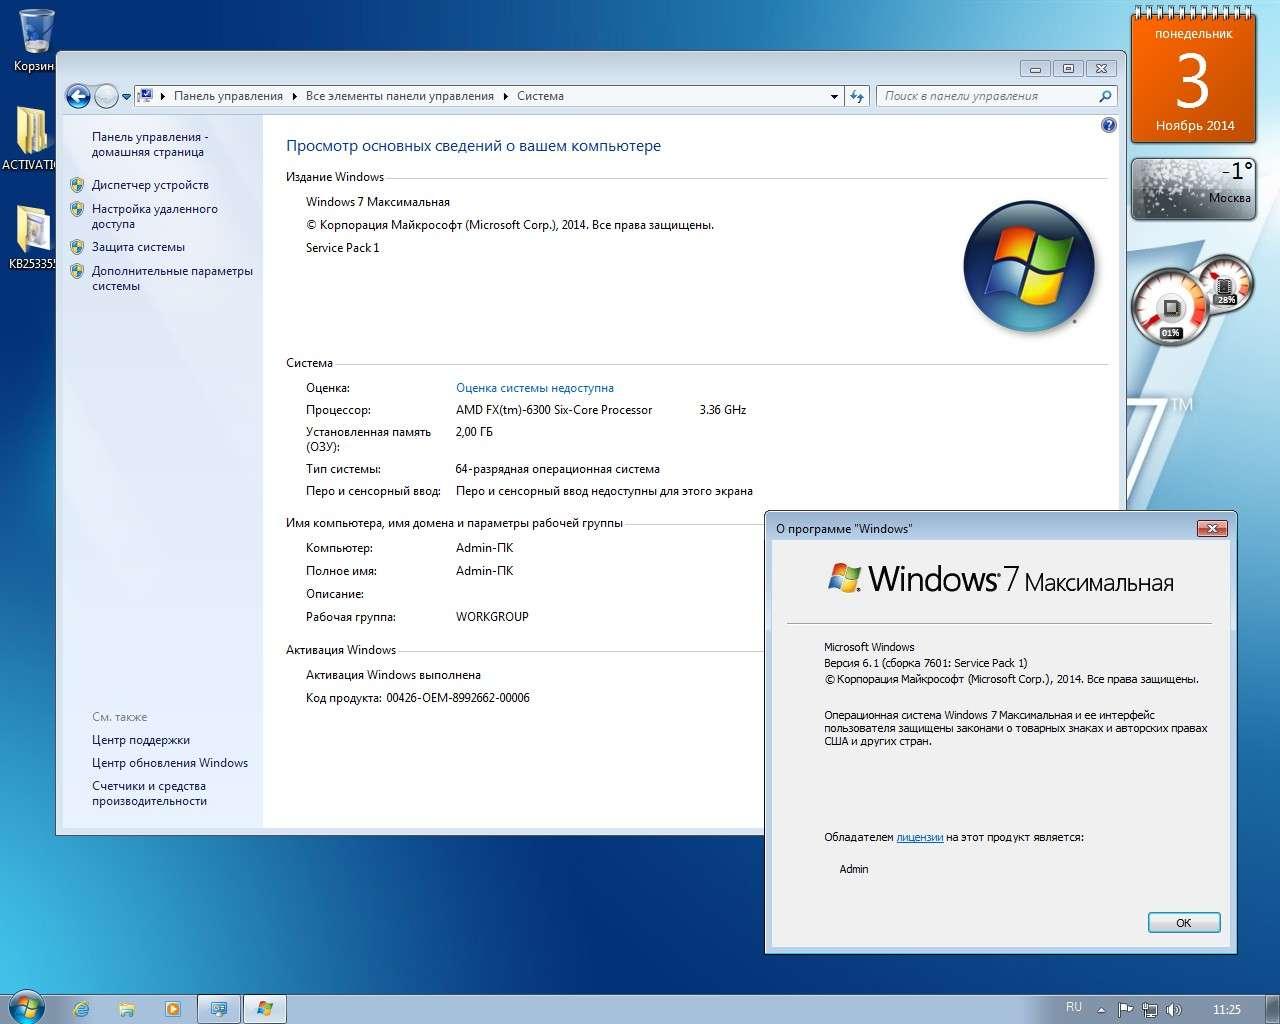 Windows 7 Ultimate SP1 (x86/x64) Elgujakviso Edition 02.11.2014 RUS